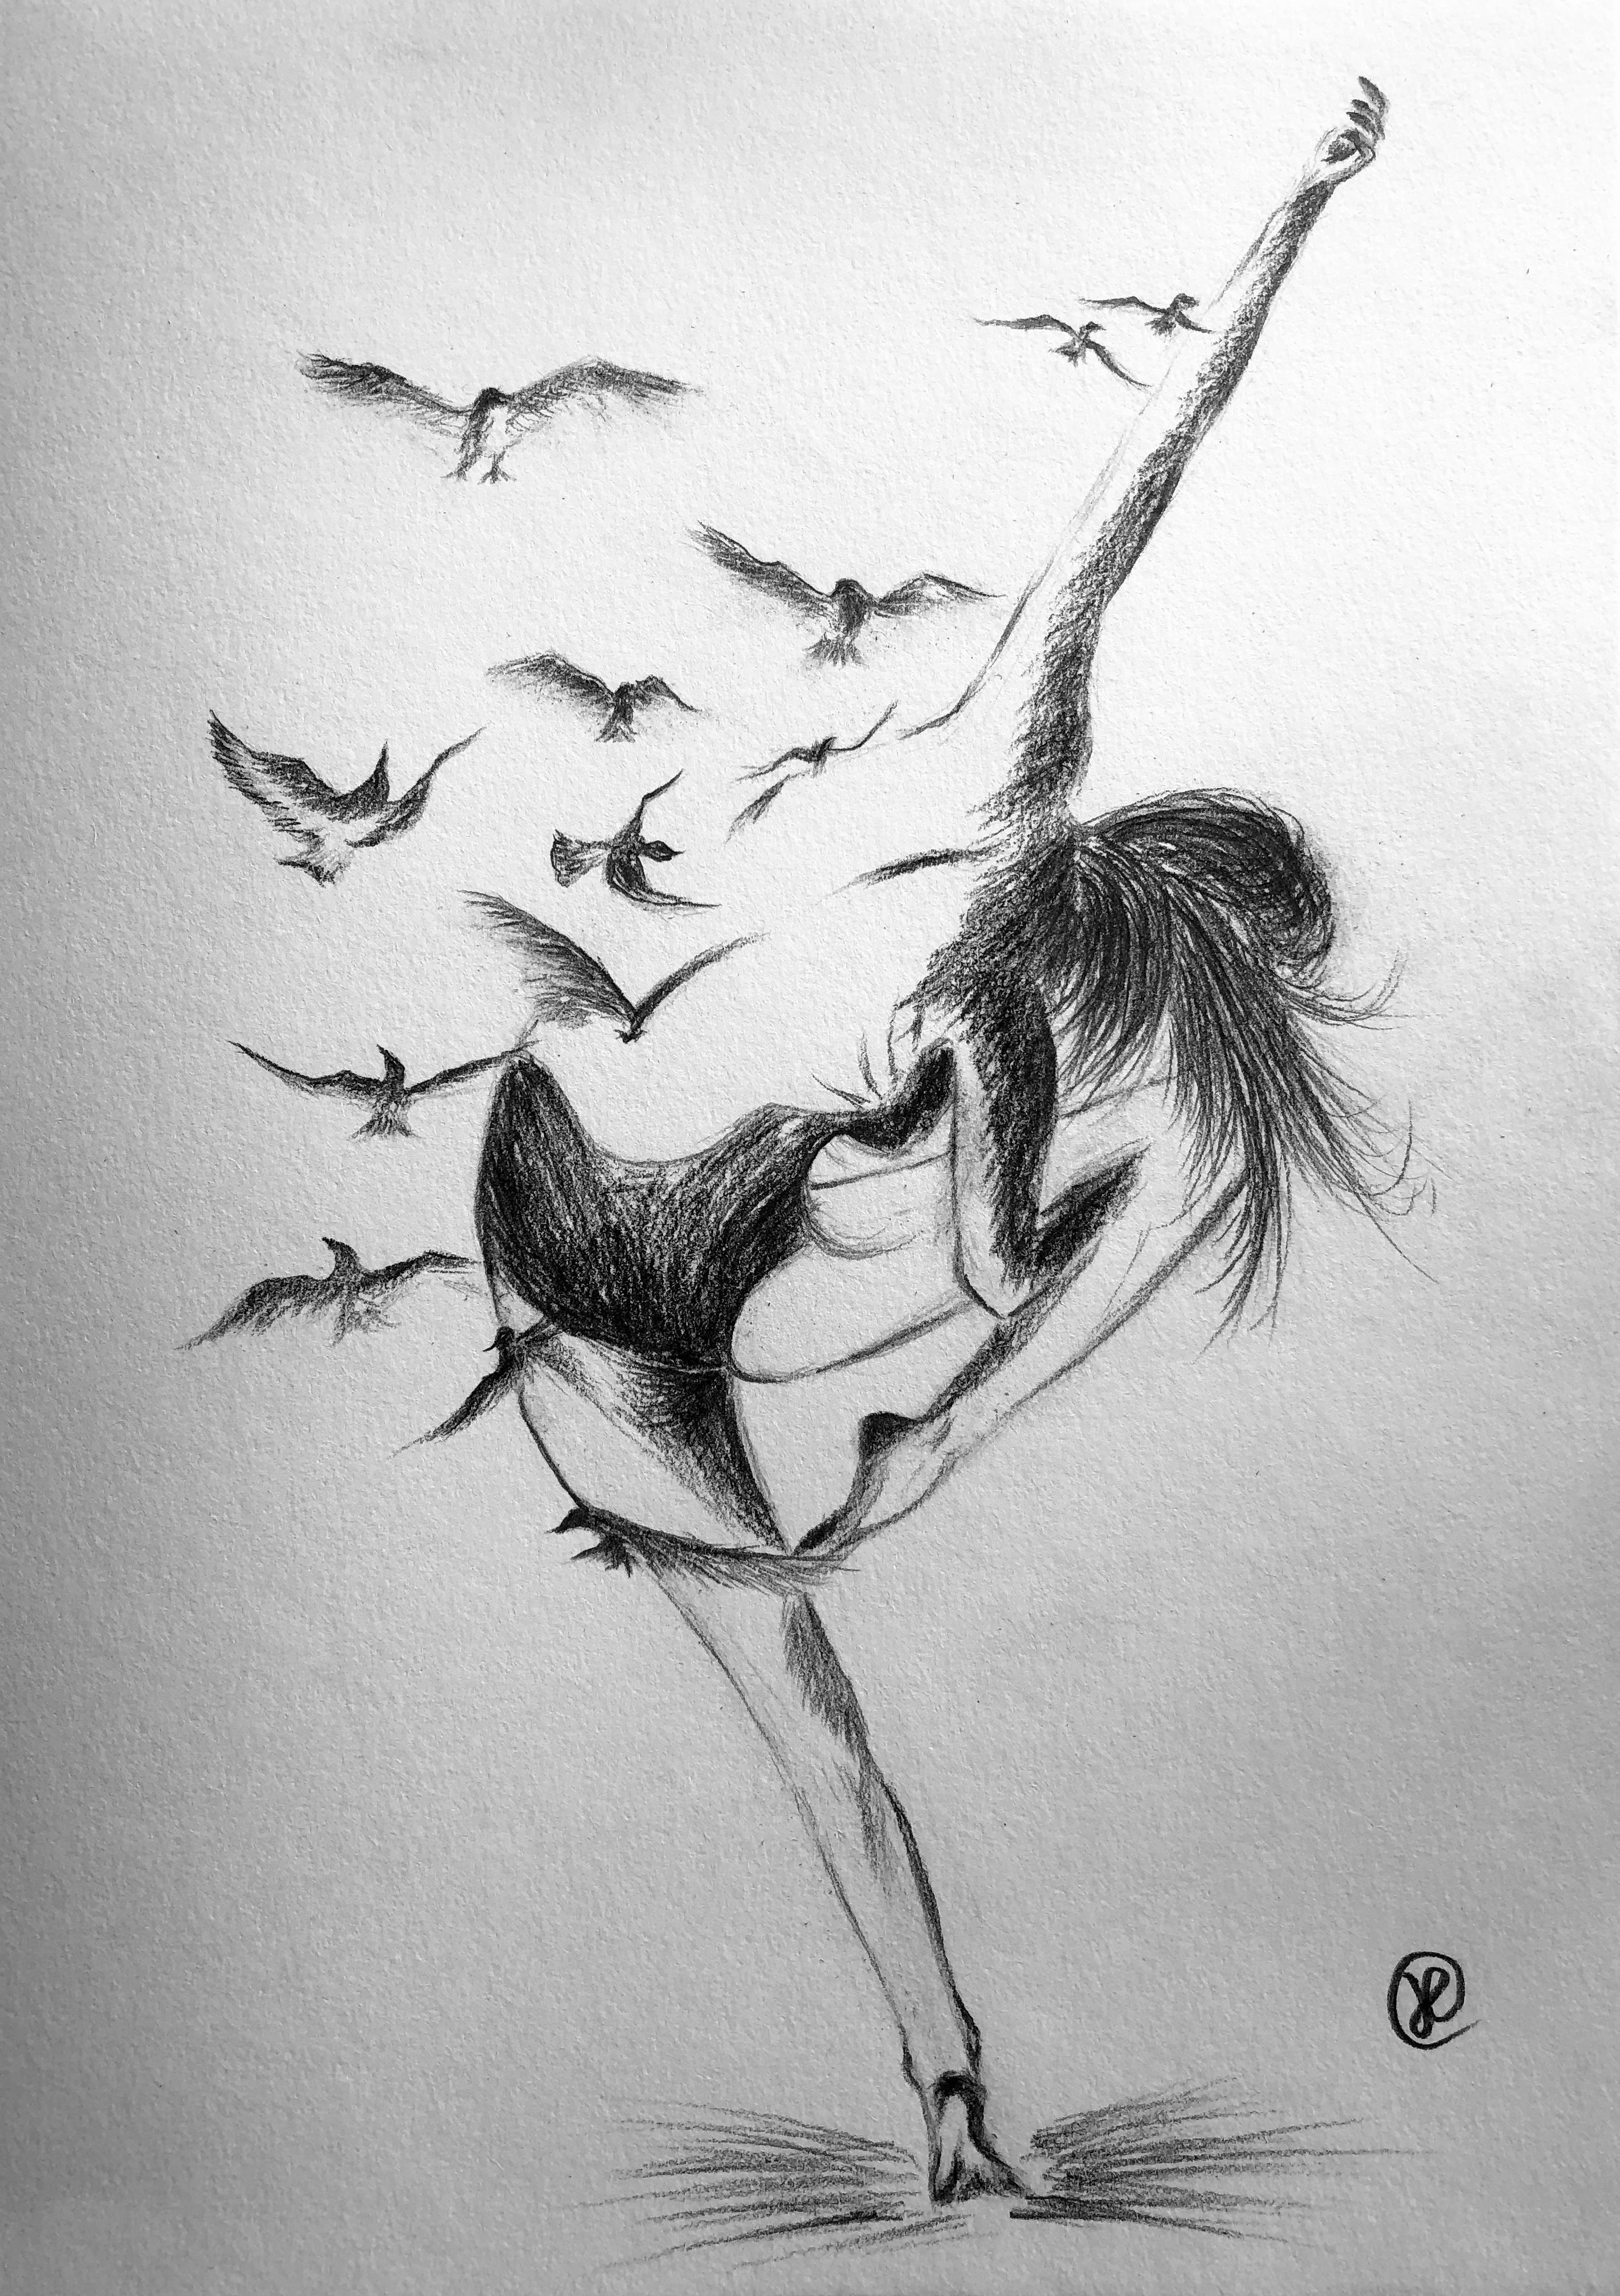 a free dancer